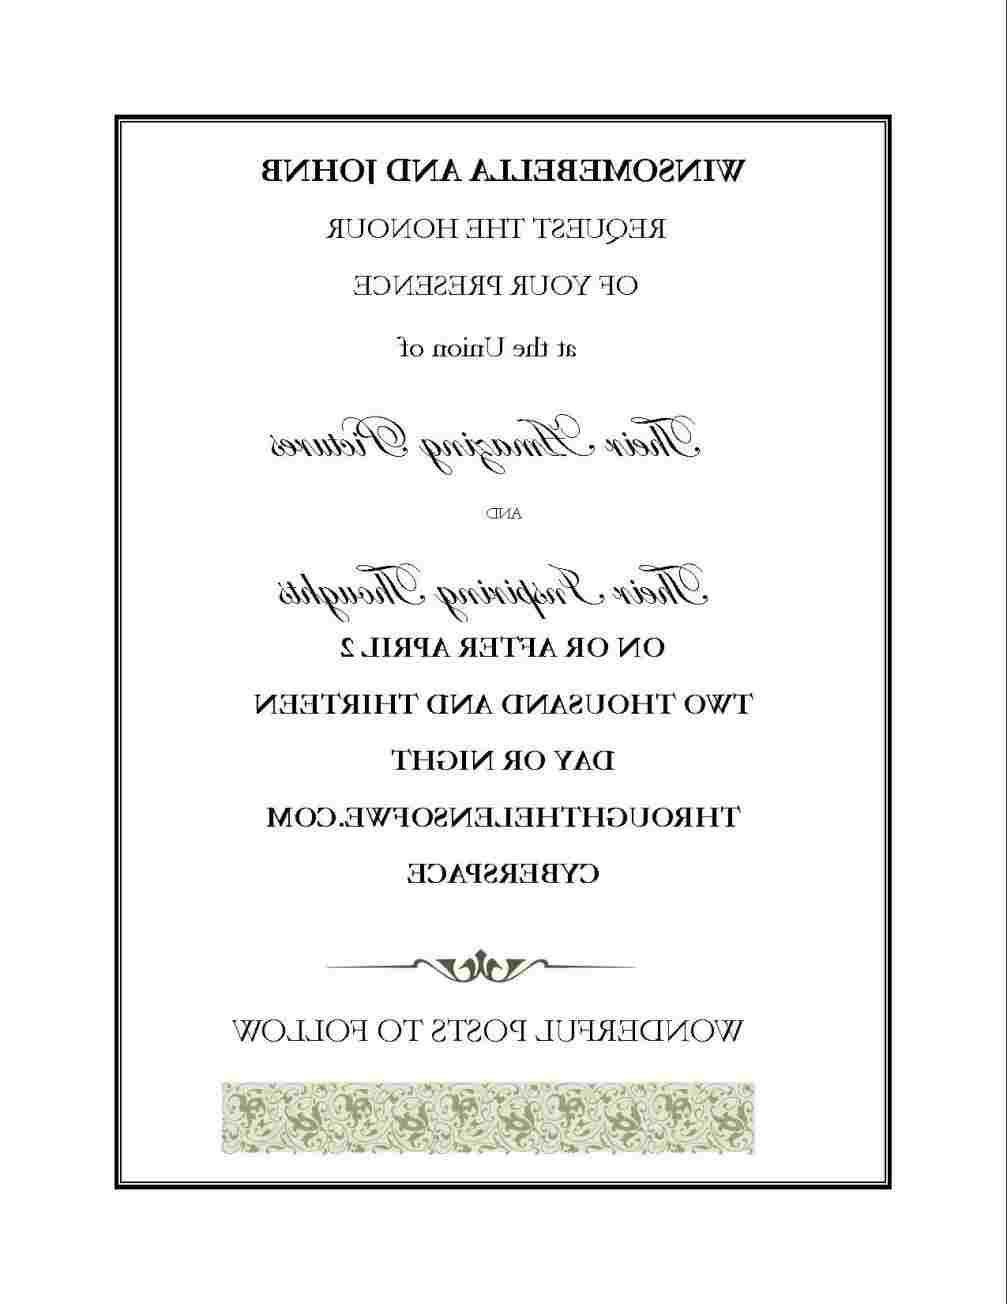 Wedding Invitation No Gifts Creative Wedding Invitations